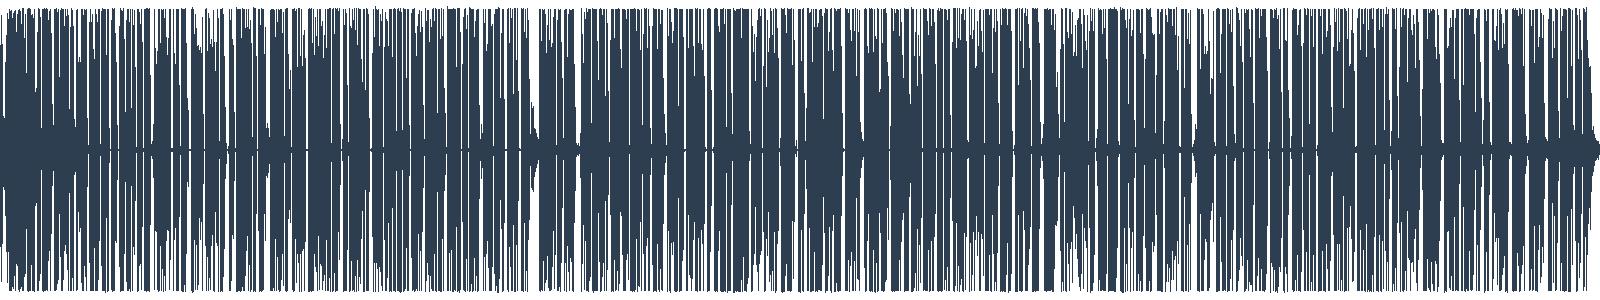 #5 Slovenský klasicizmus (Maturita s Hashtagom) waveform